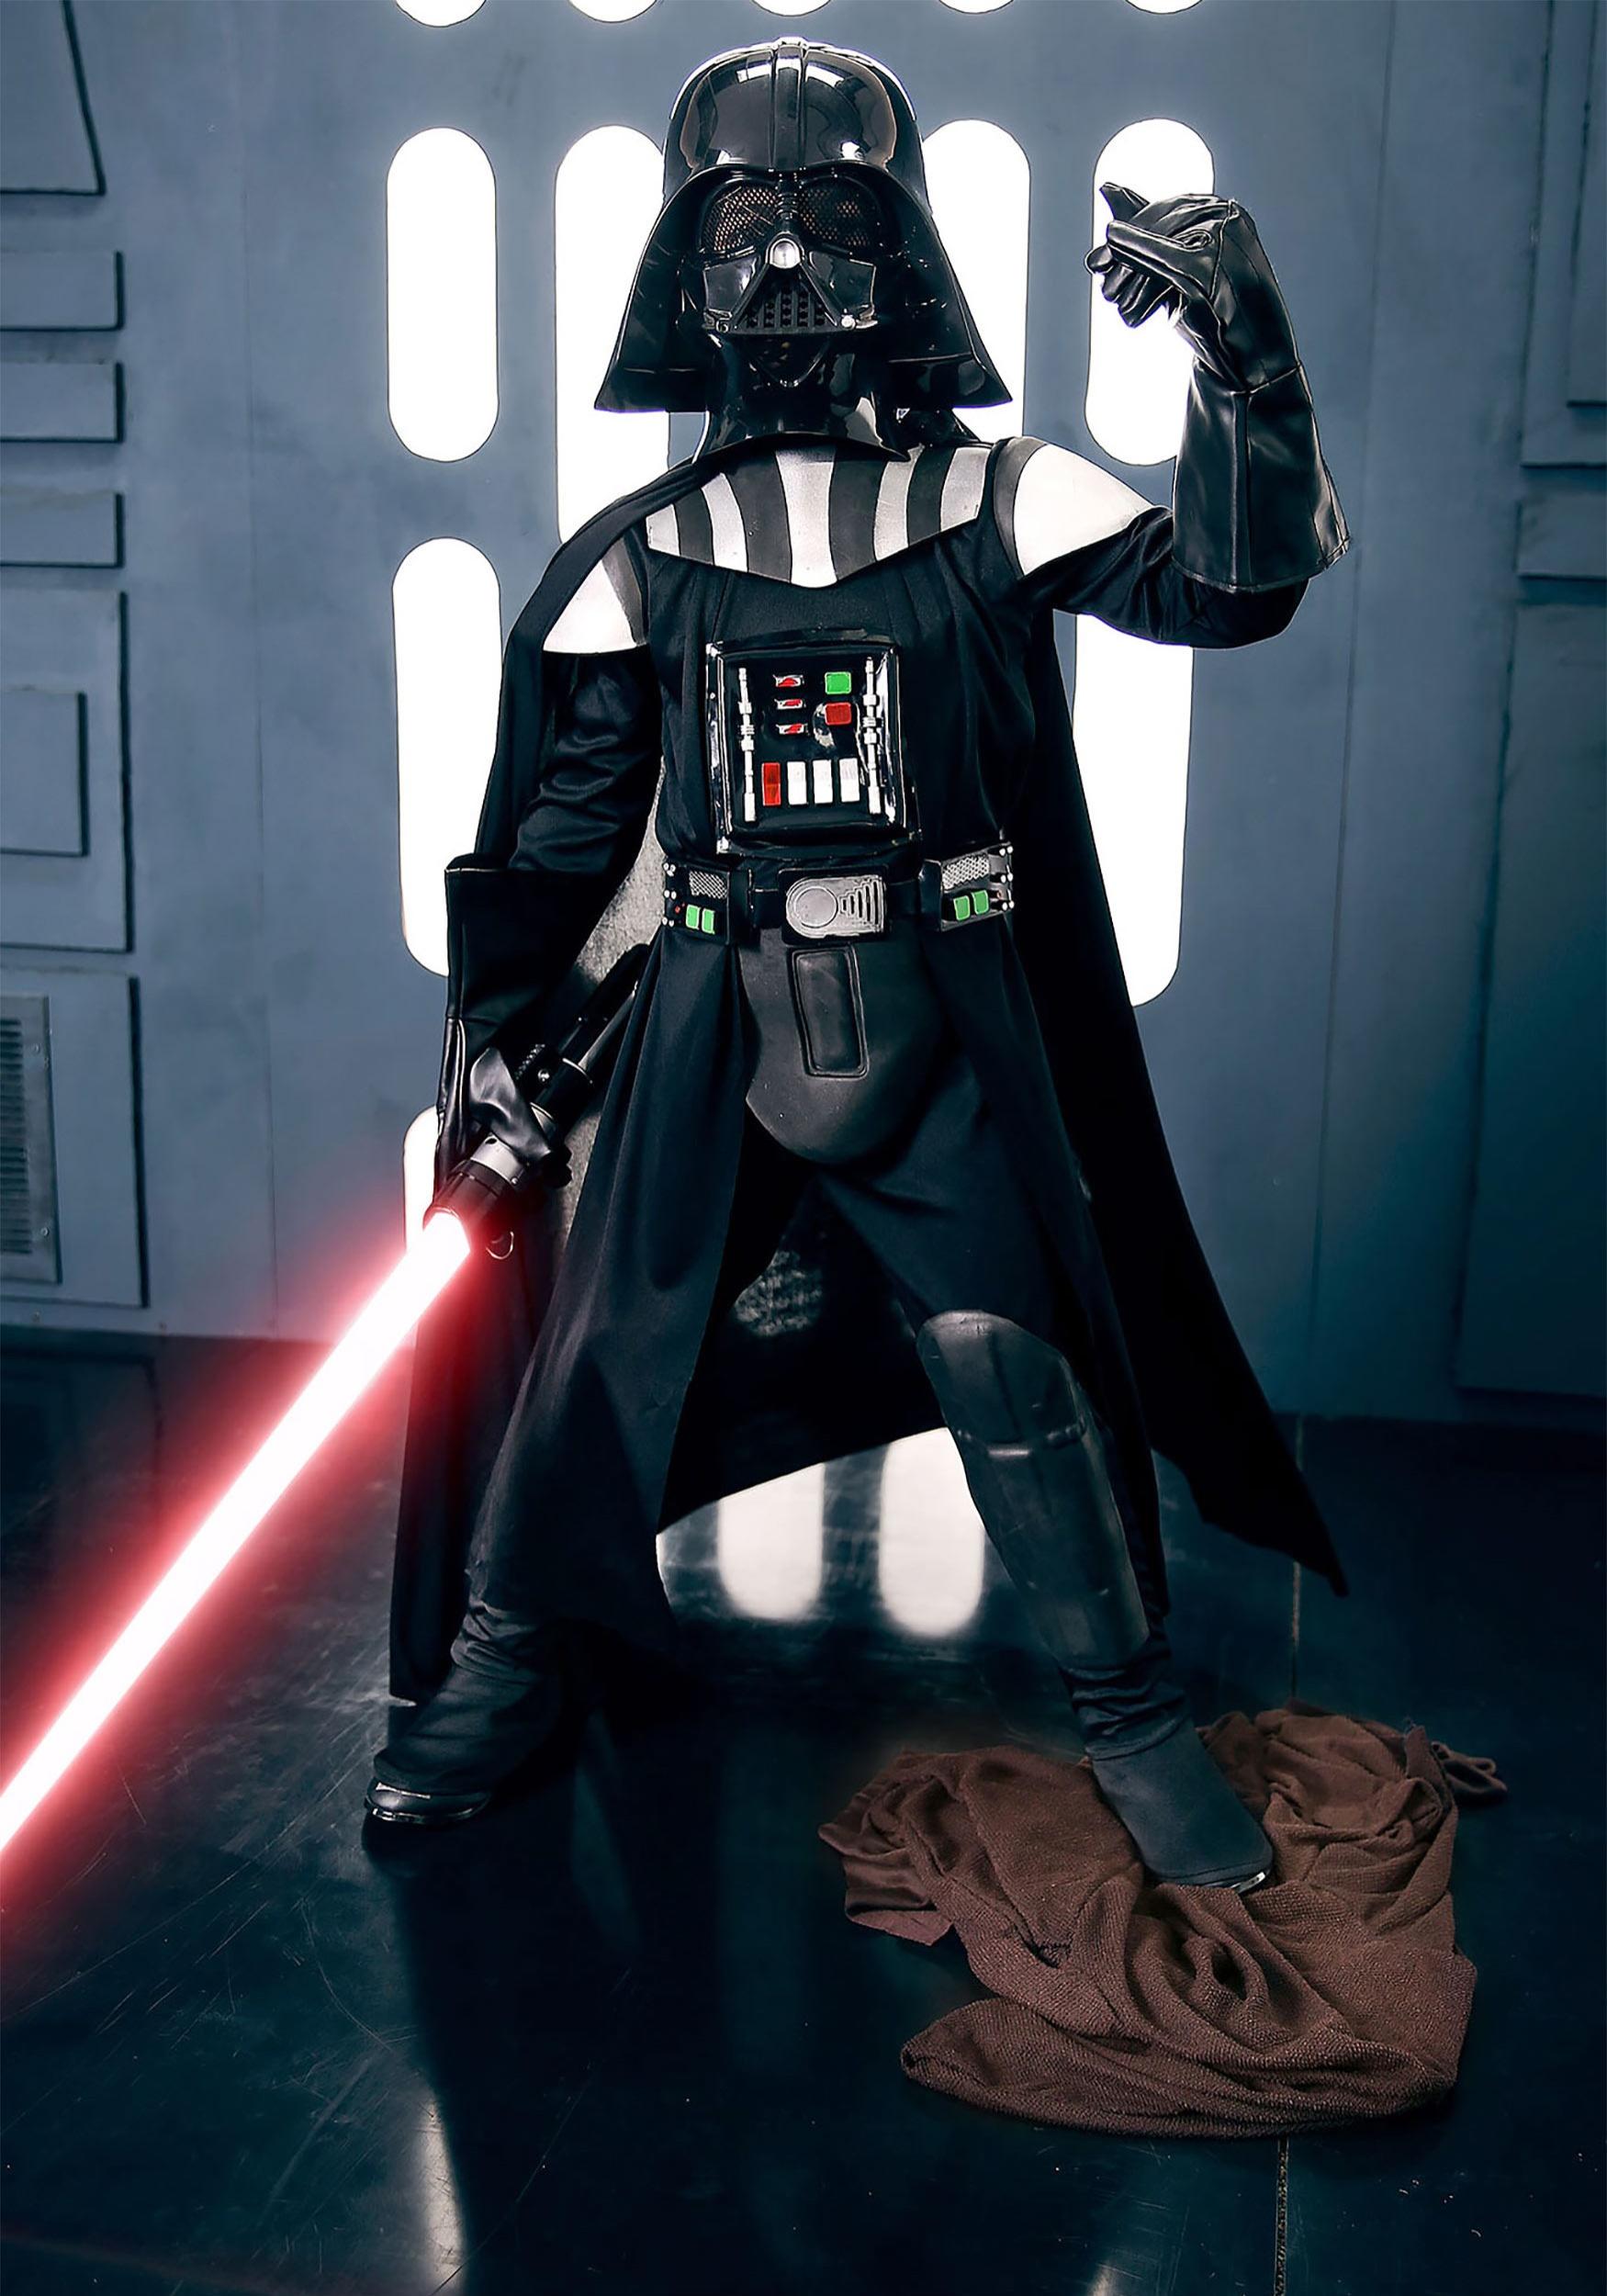 Child Deluxe Darth Vader Costume & Kids Star Wars Costumes - Child Toddler Halloween Costume